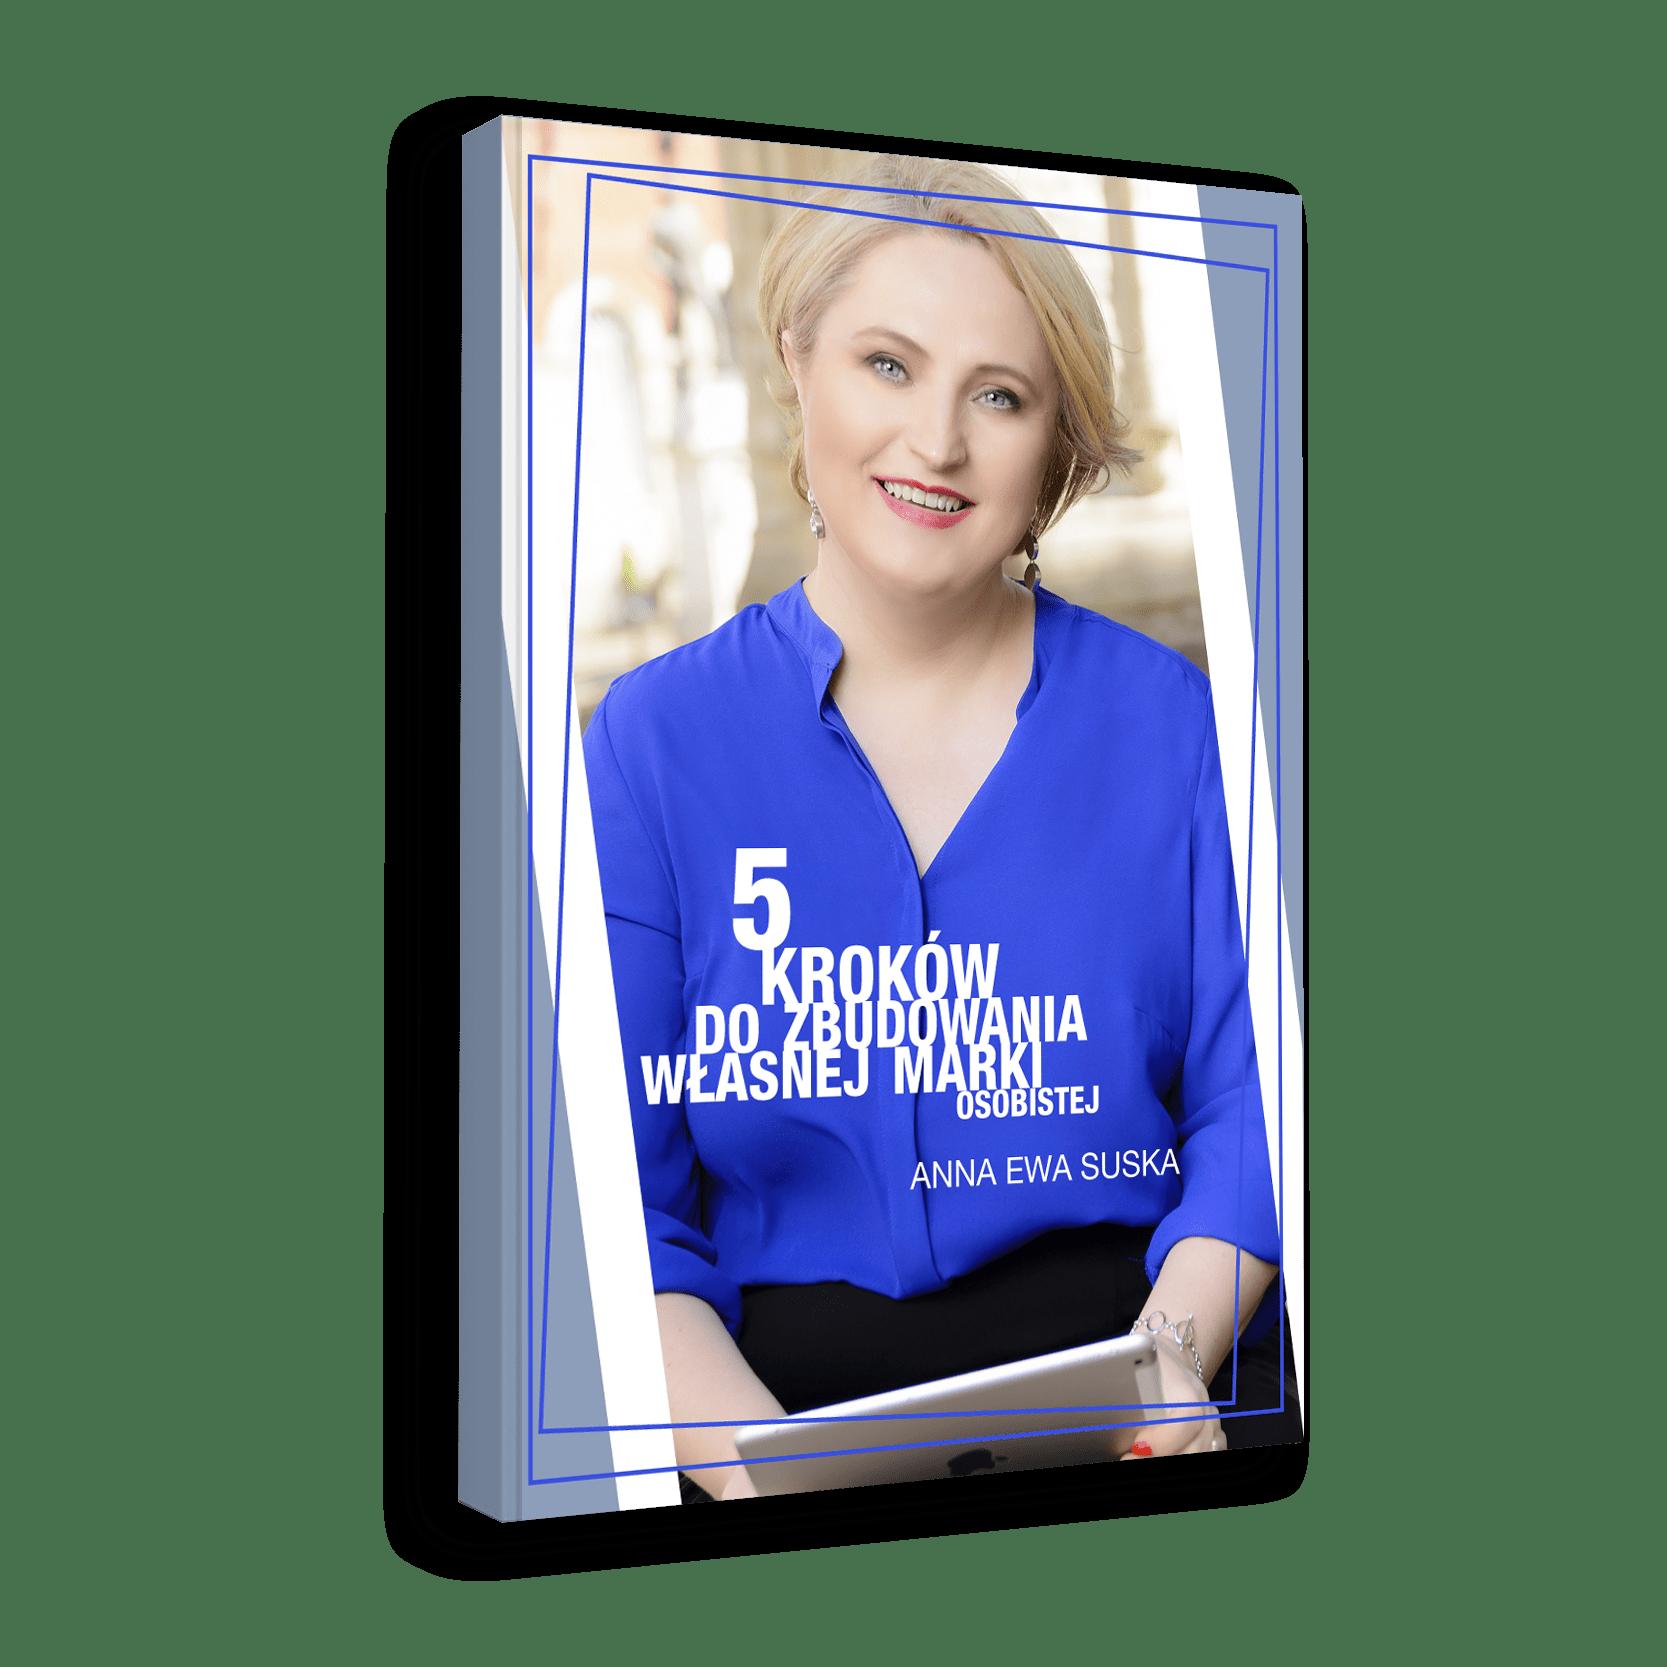 5 kroków do zbudowania własnej marki ExcellenceVale Anna Ewa Suska